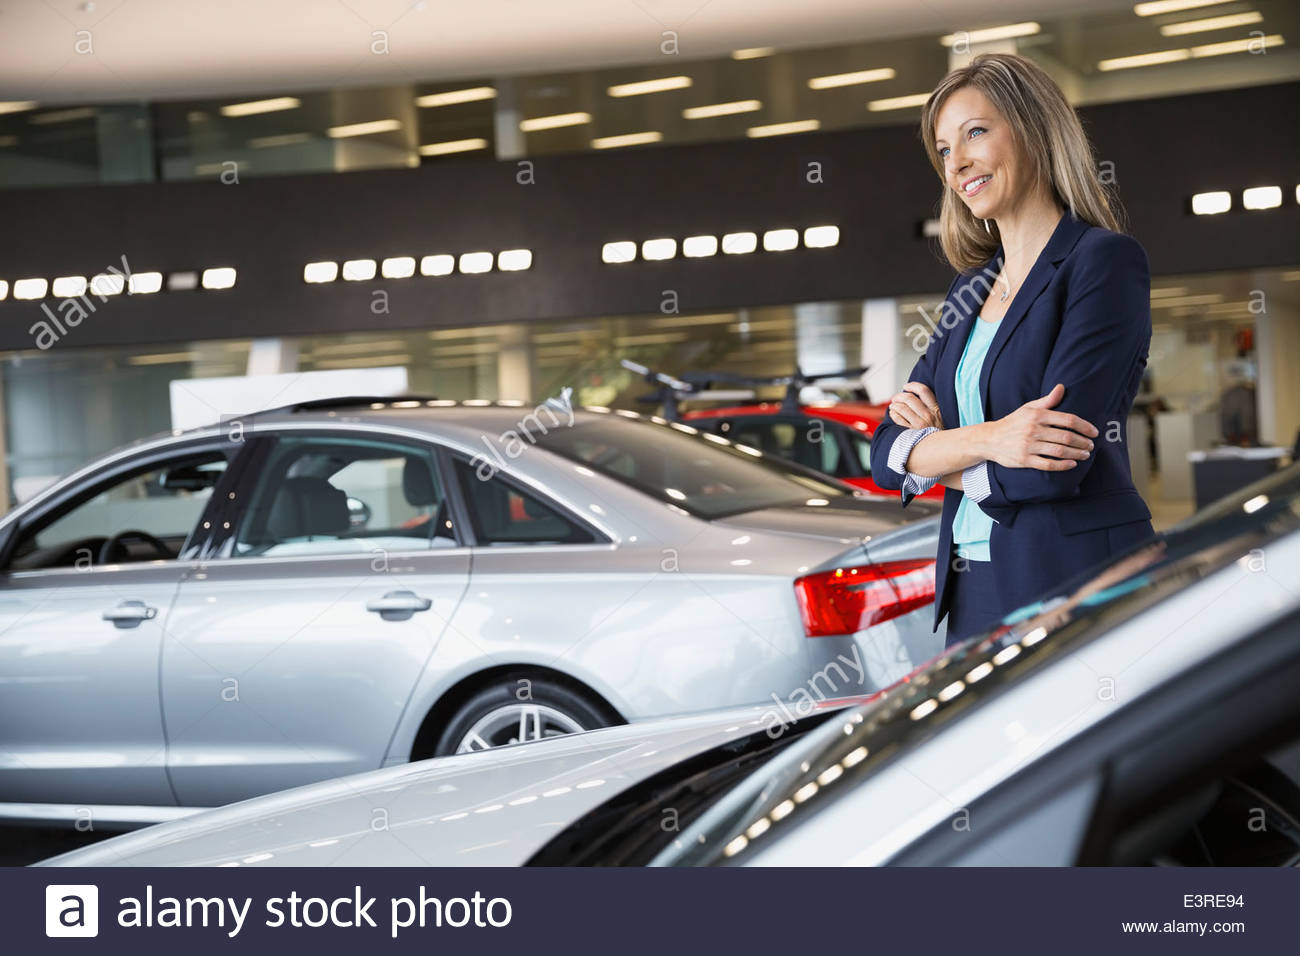 Confident saleswoman in car dealership showroom - Stock Image